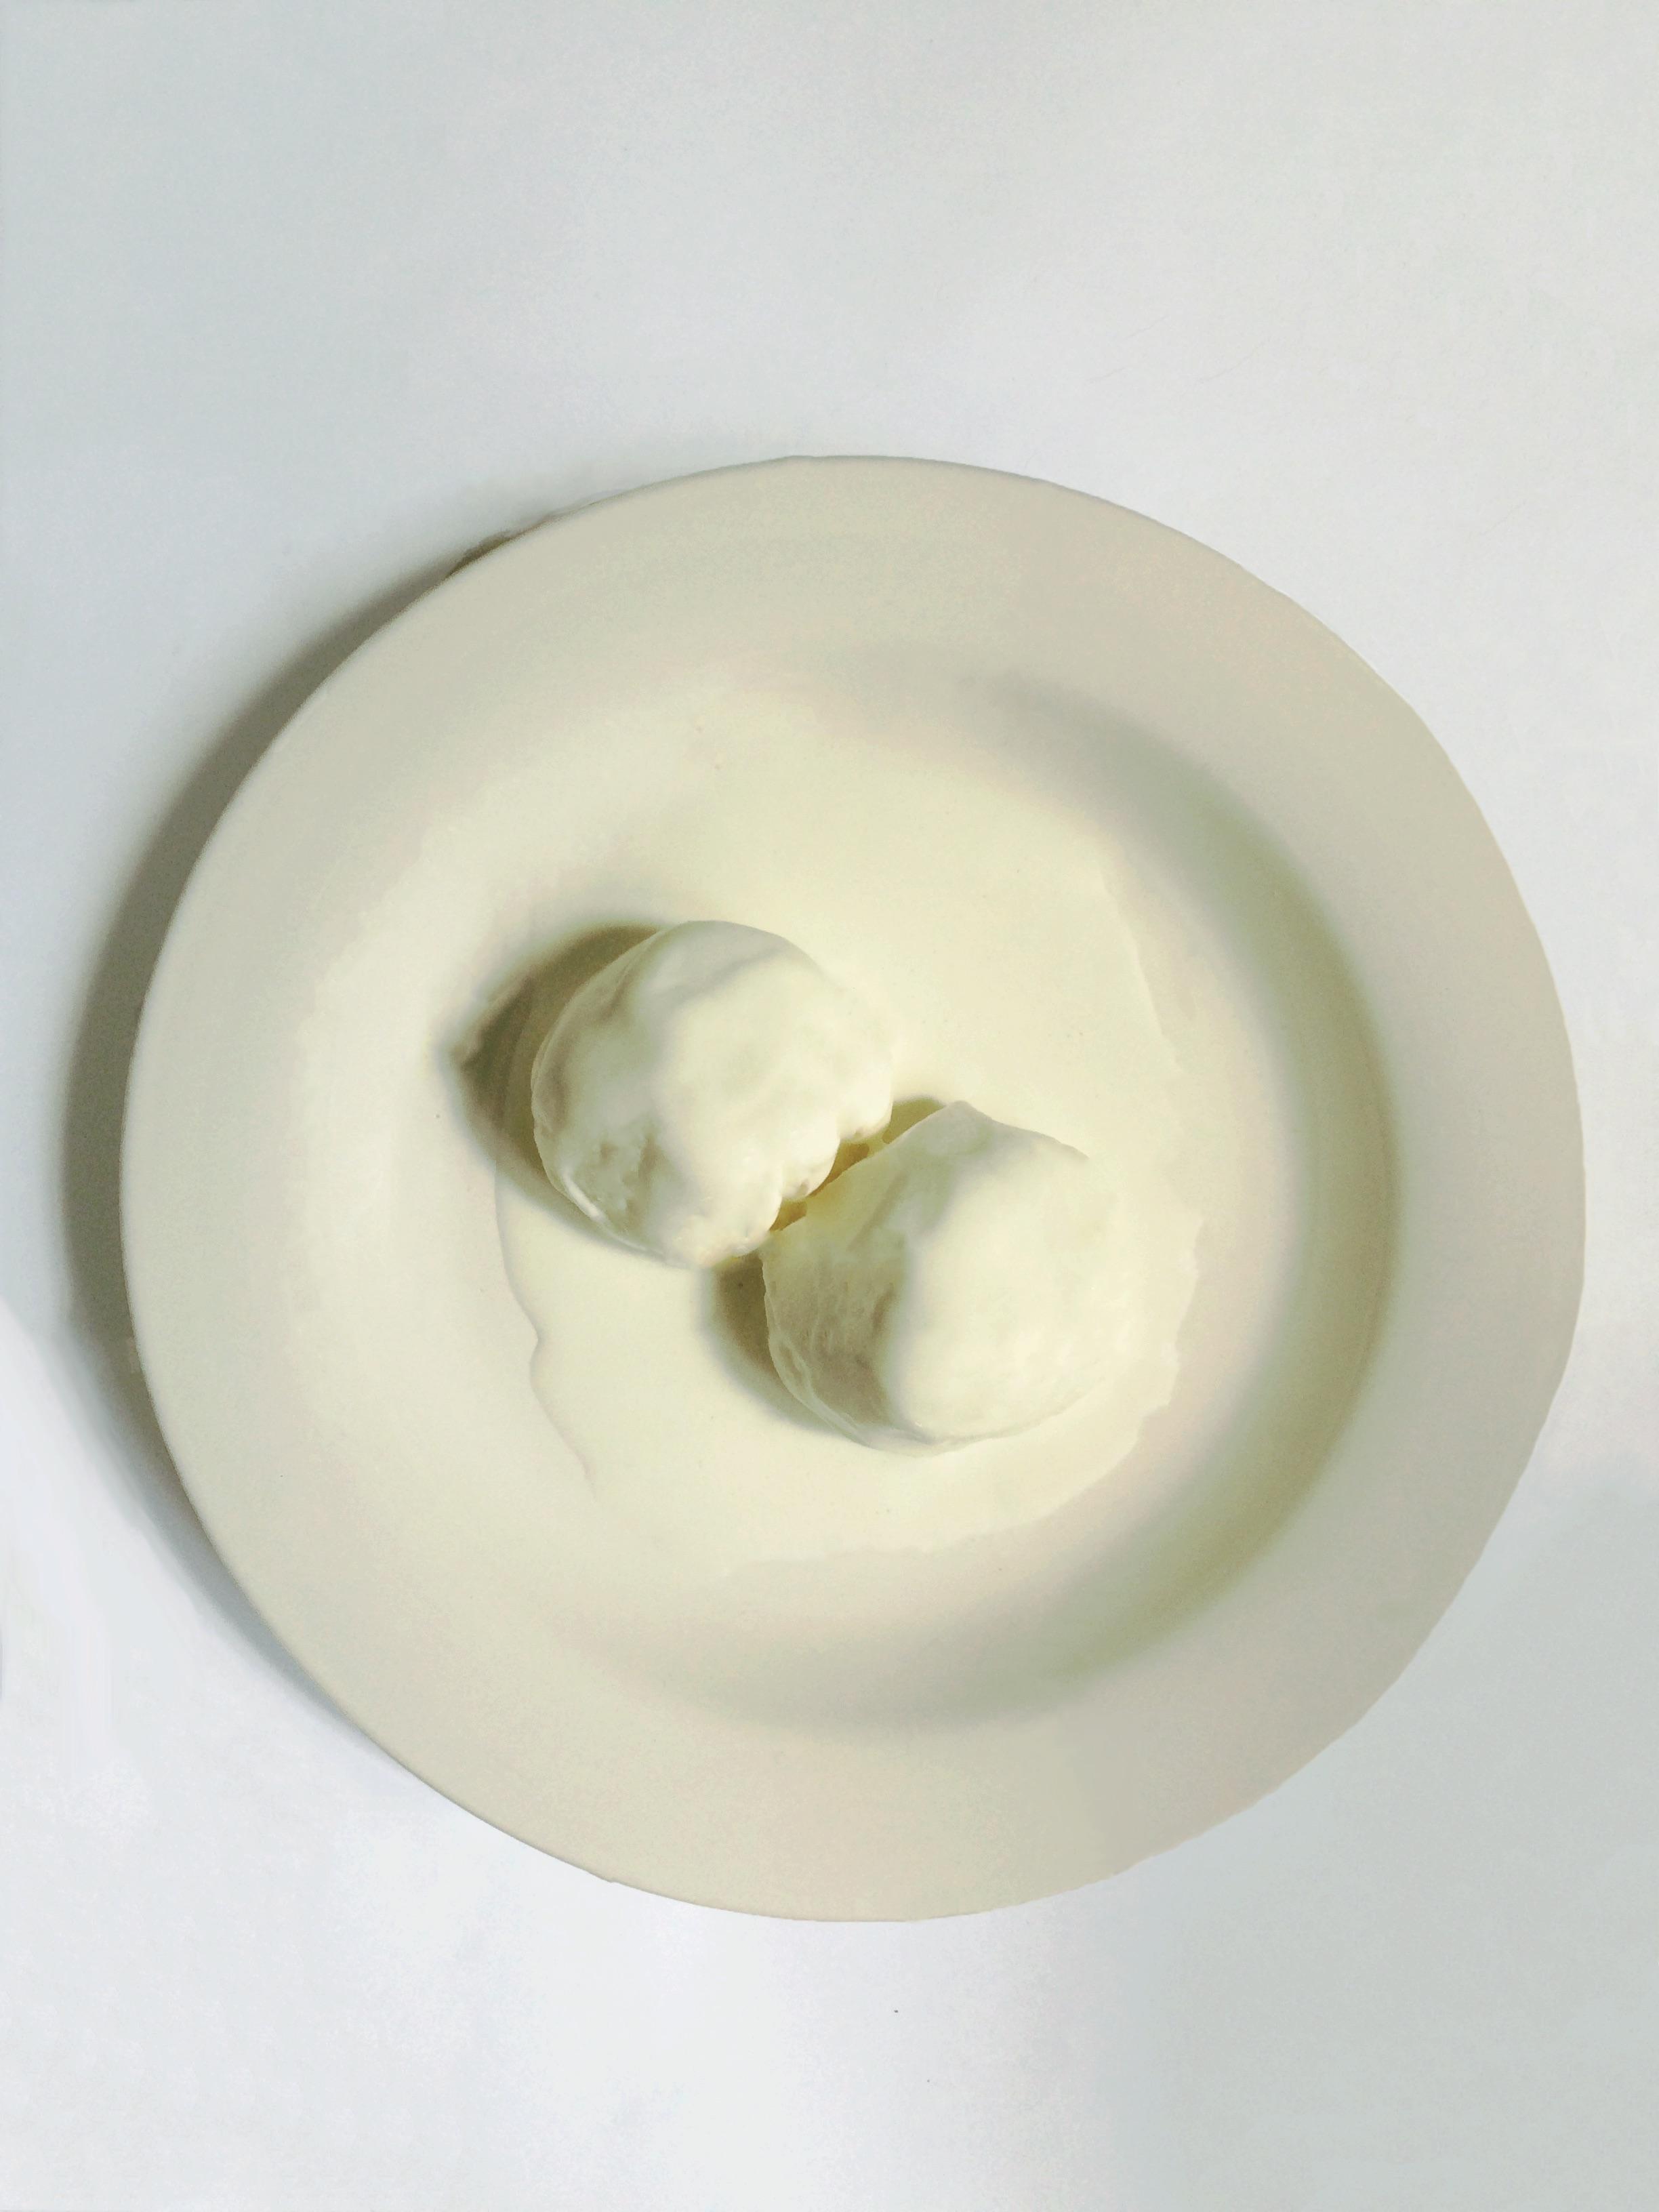 3_recipes_meltingicecap.jpg